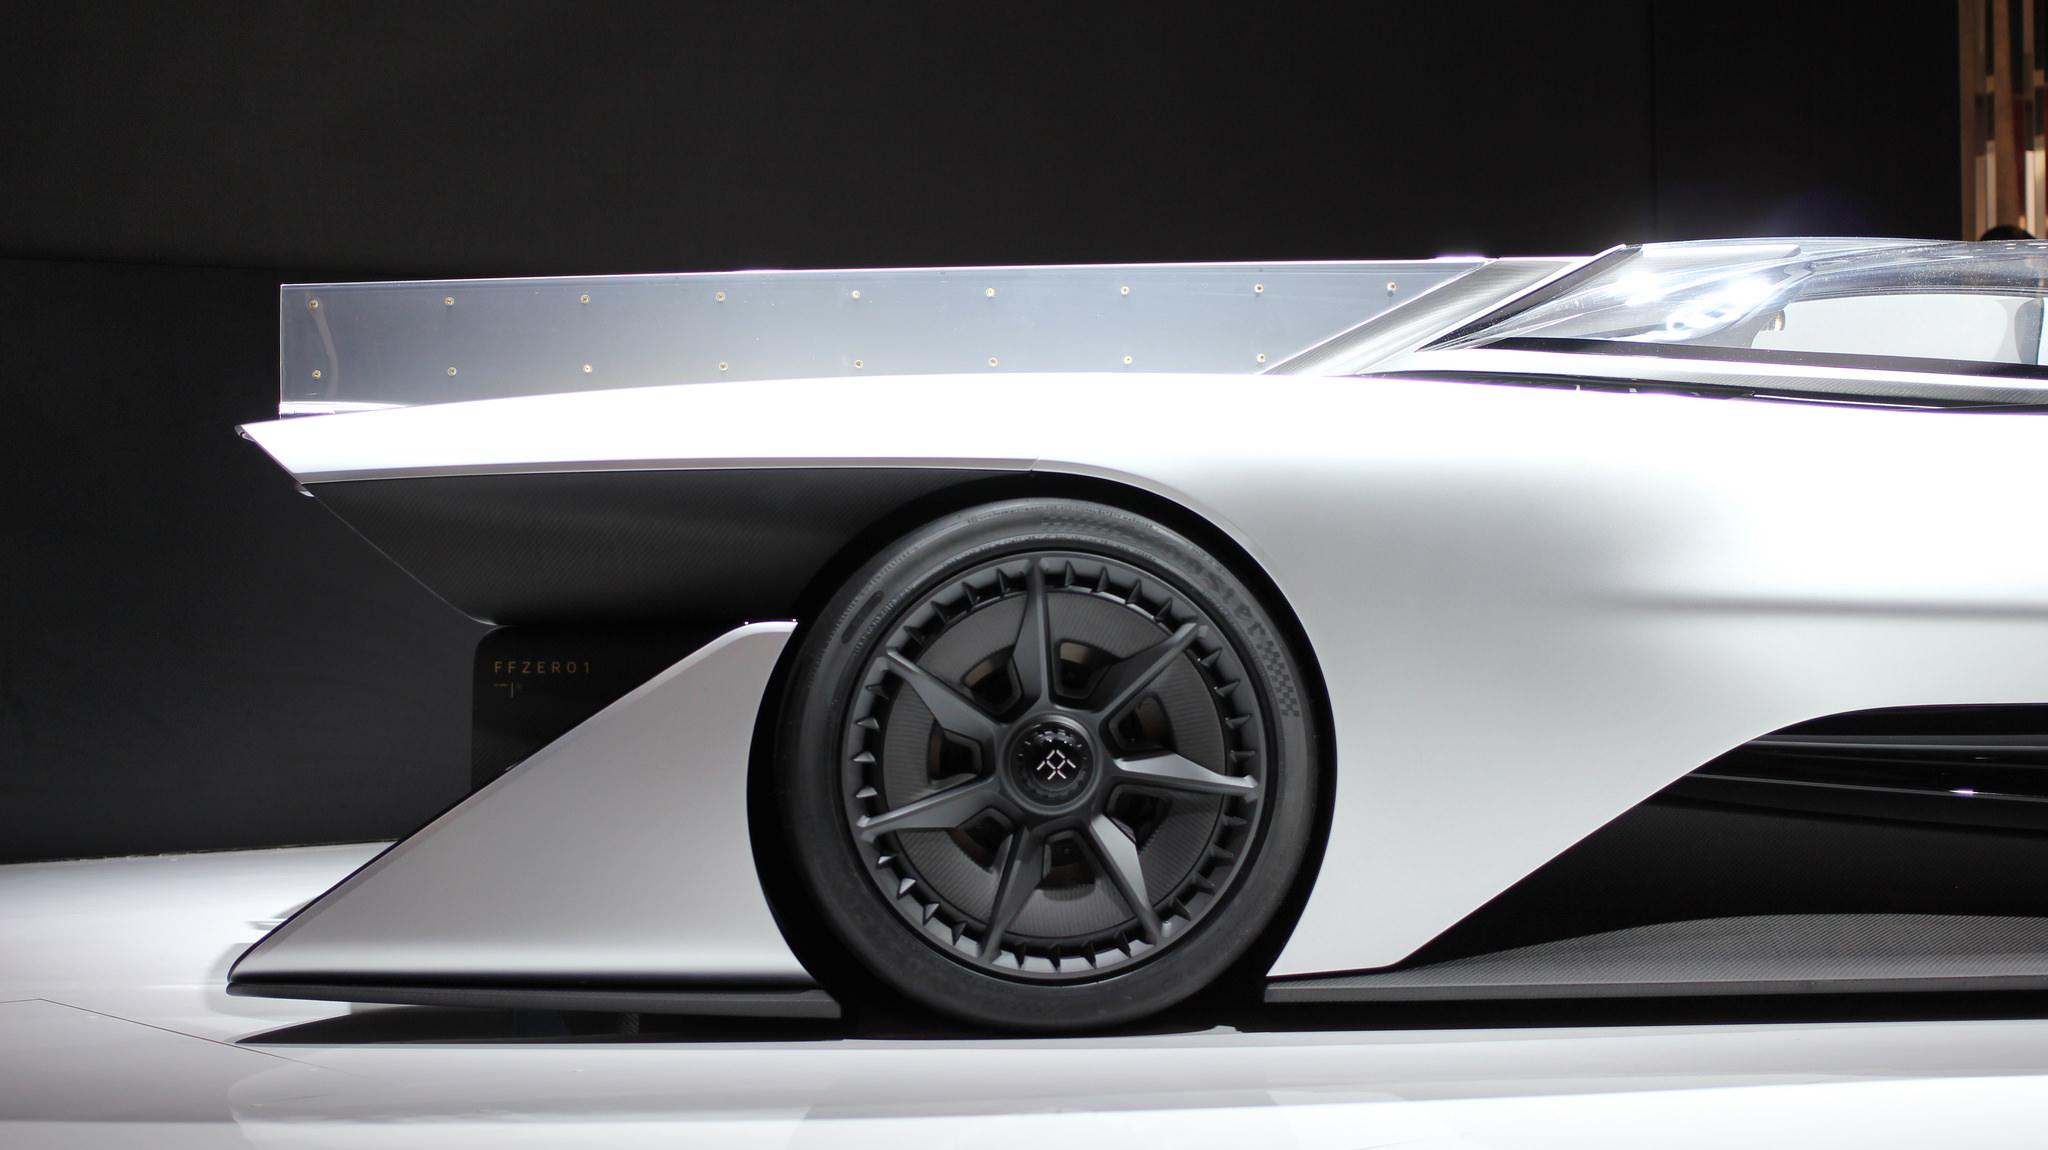 Faraday Future concept car CES 2016